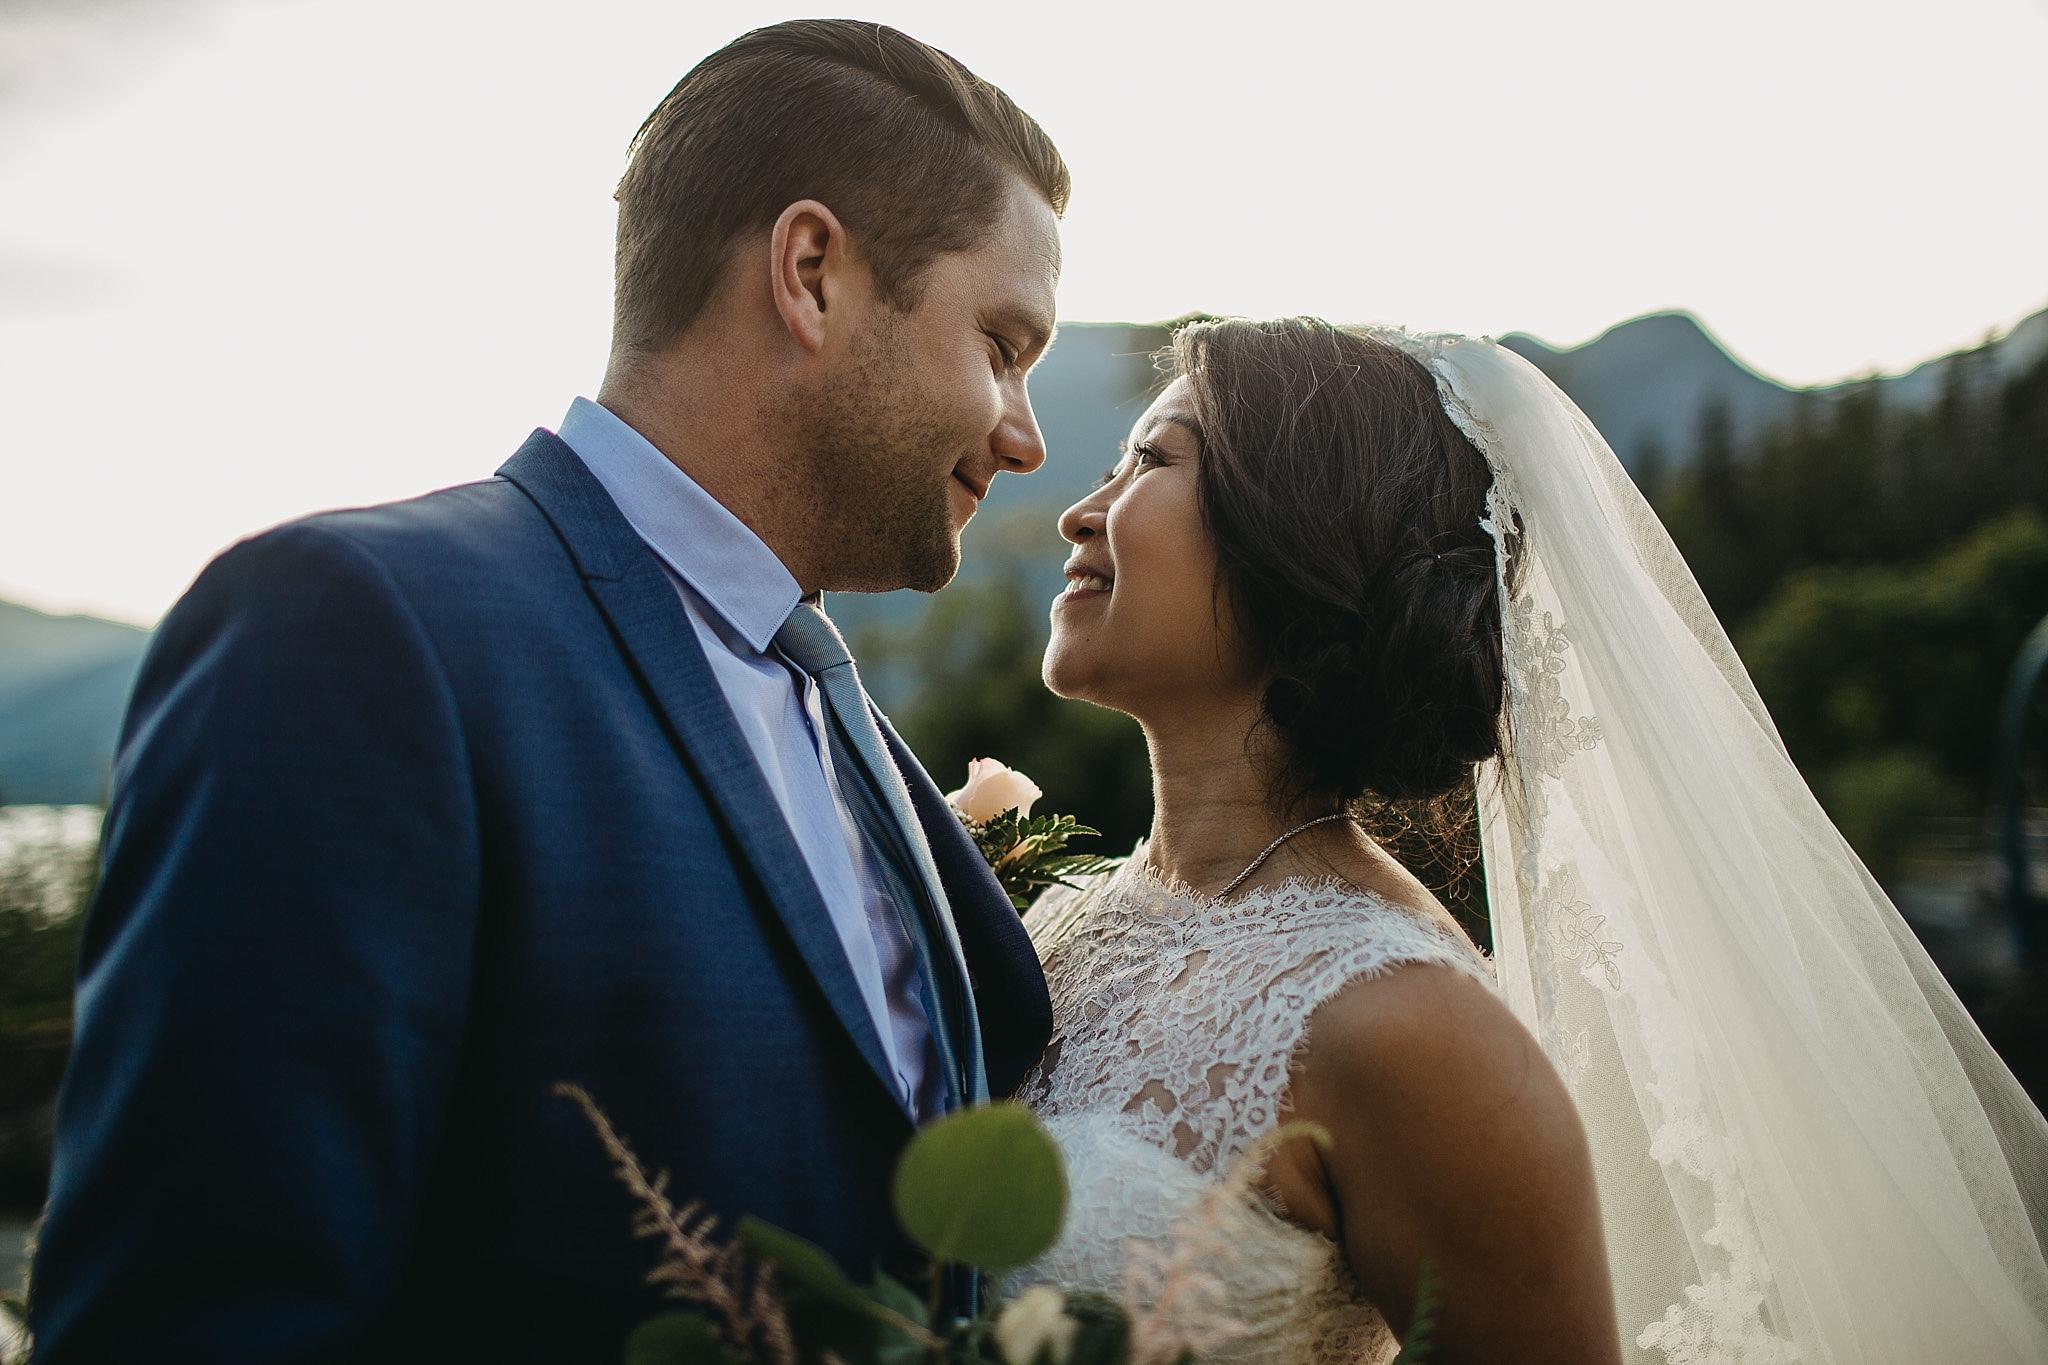 aileen-choi-photo-hart-house-wedding_0105.jpg